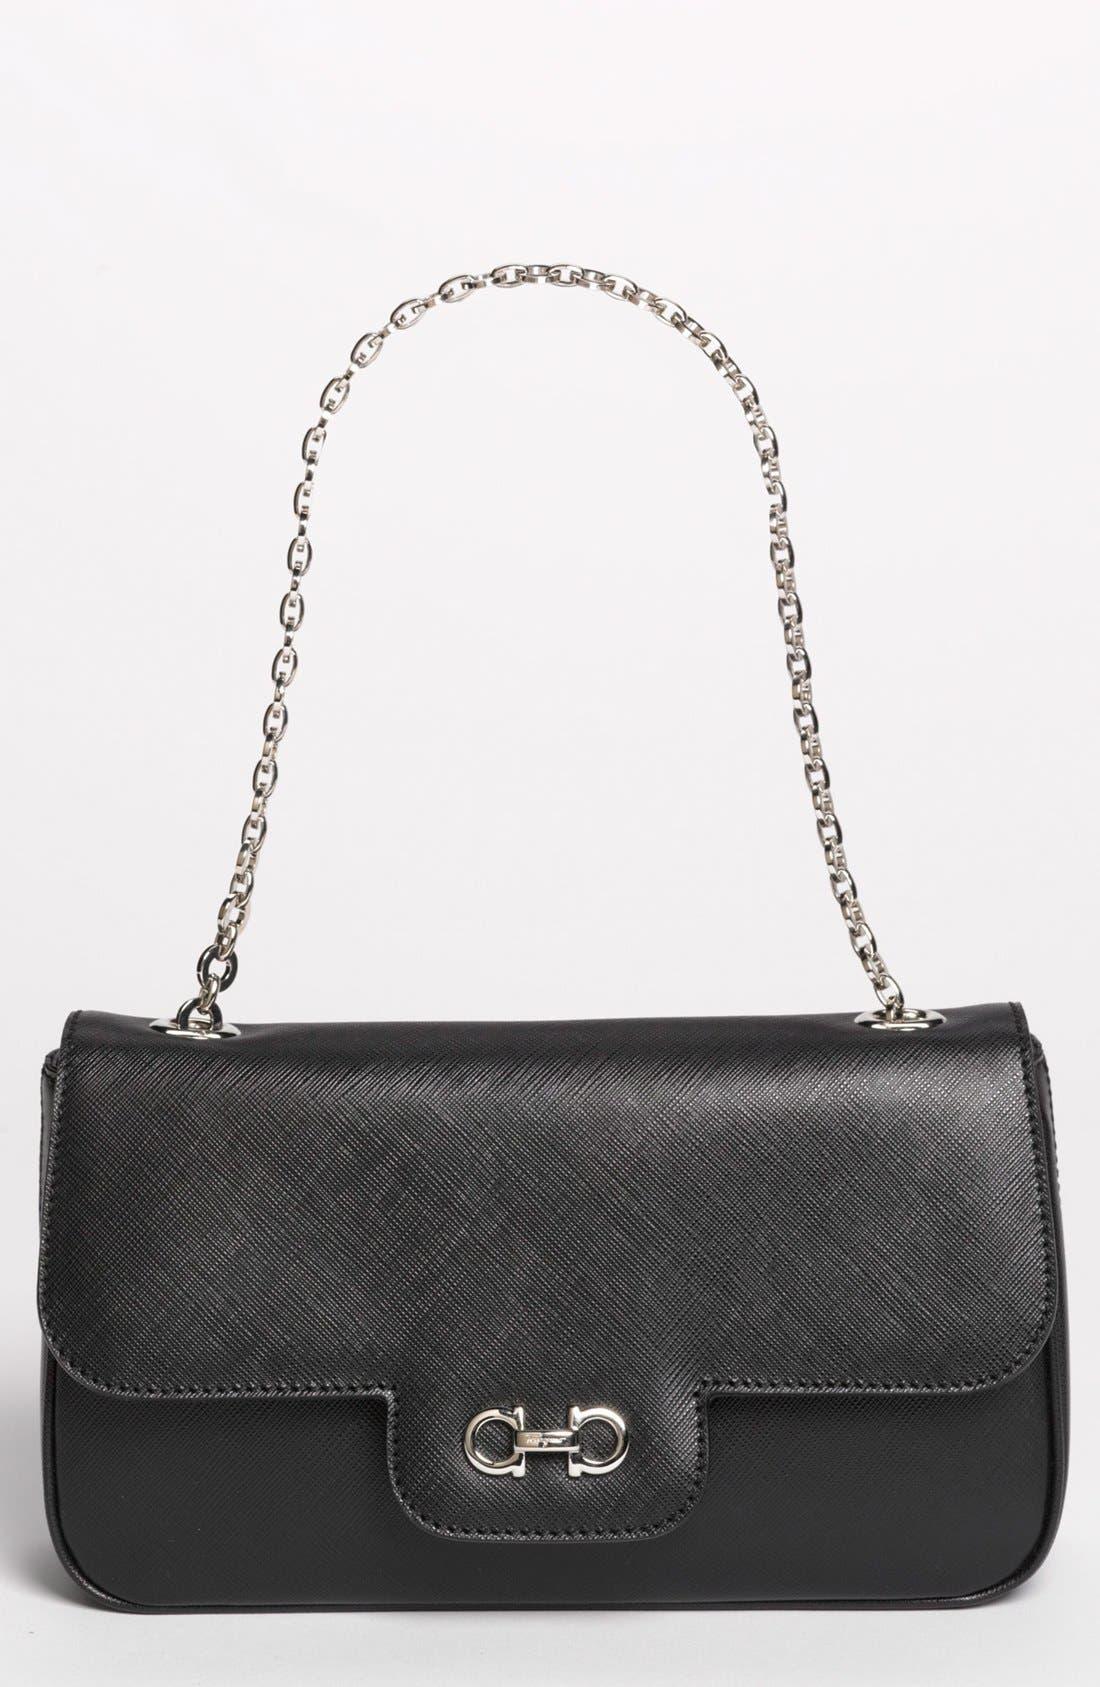 Alternate Image 1 Selected - Salvatore Ferragamo 'Luciana' Leather Shoulder Bag